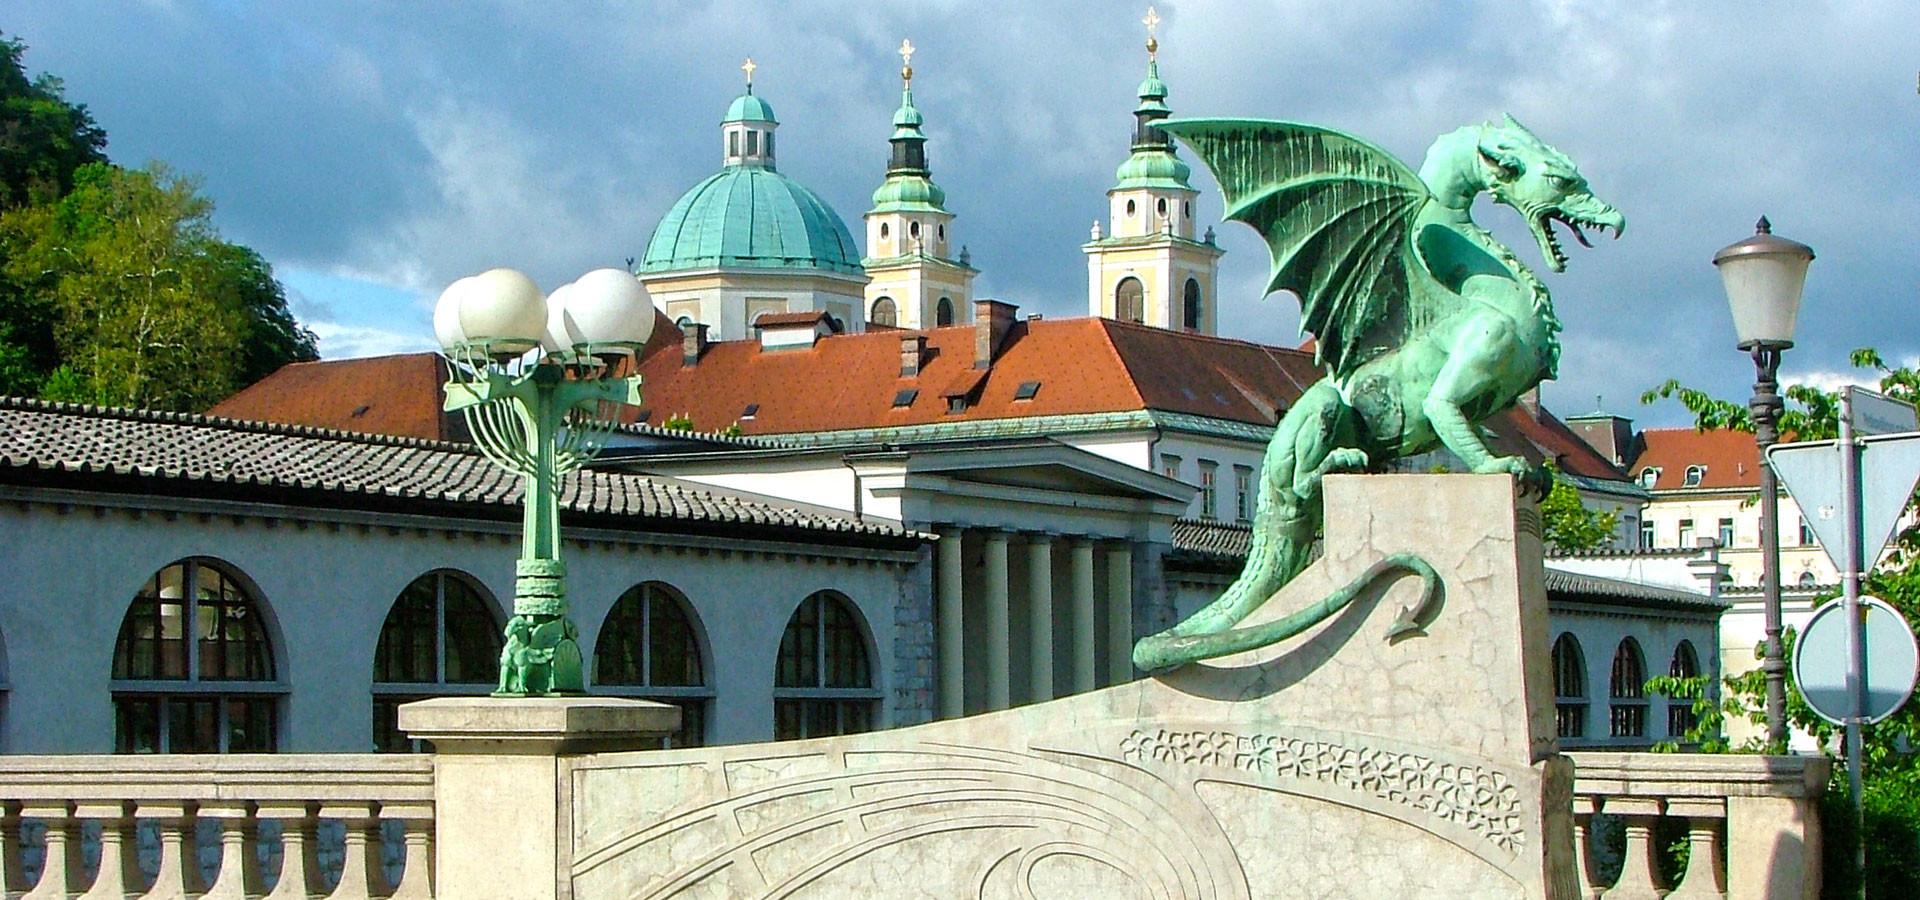 Esperienza a Lubiana, Slovenia di Nina